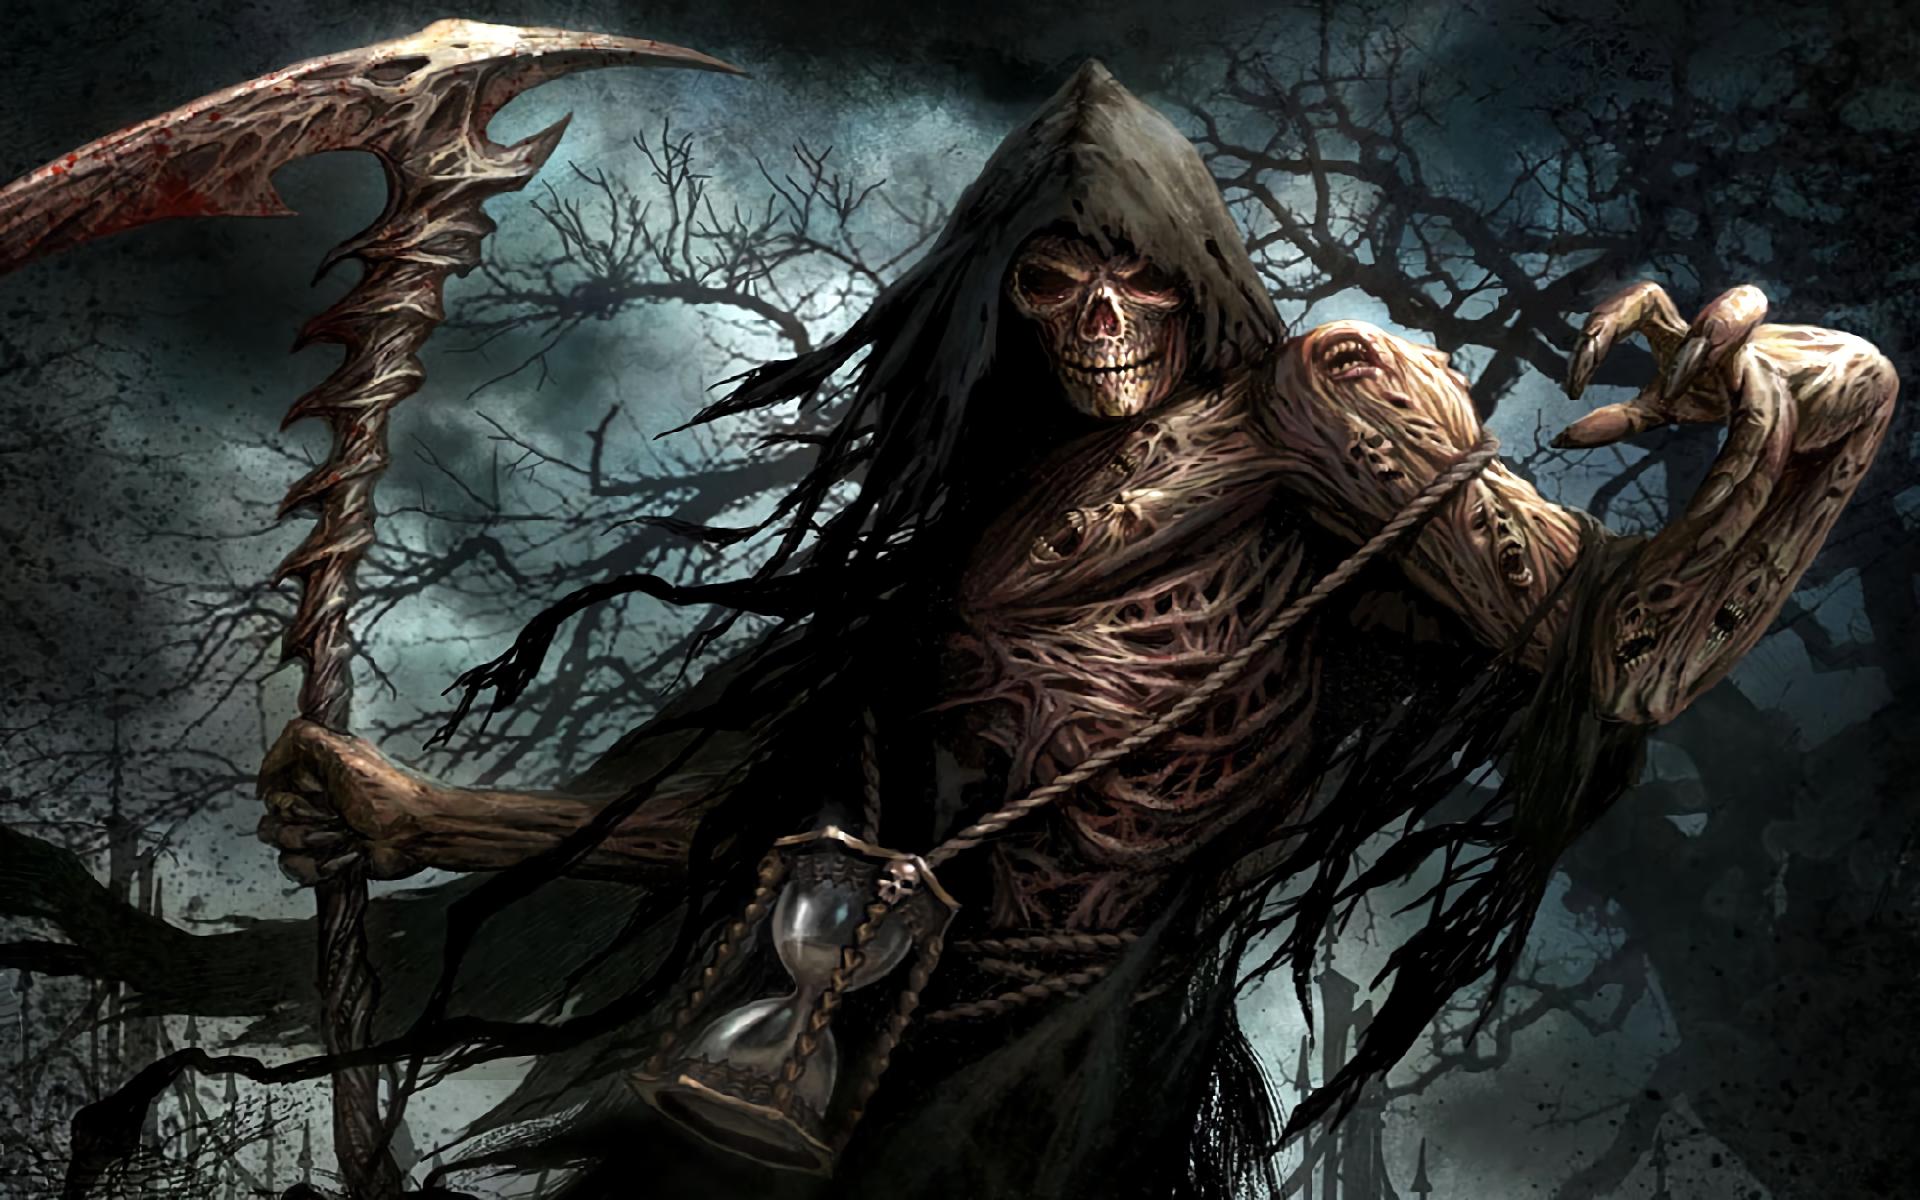 Hd Wallpaper Background Id 236134 1920x1200 Dark Grim Reaper 71 Like Favorite Mystery Games Grim Reaper Art Grim Reaper